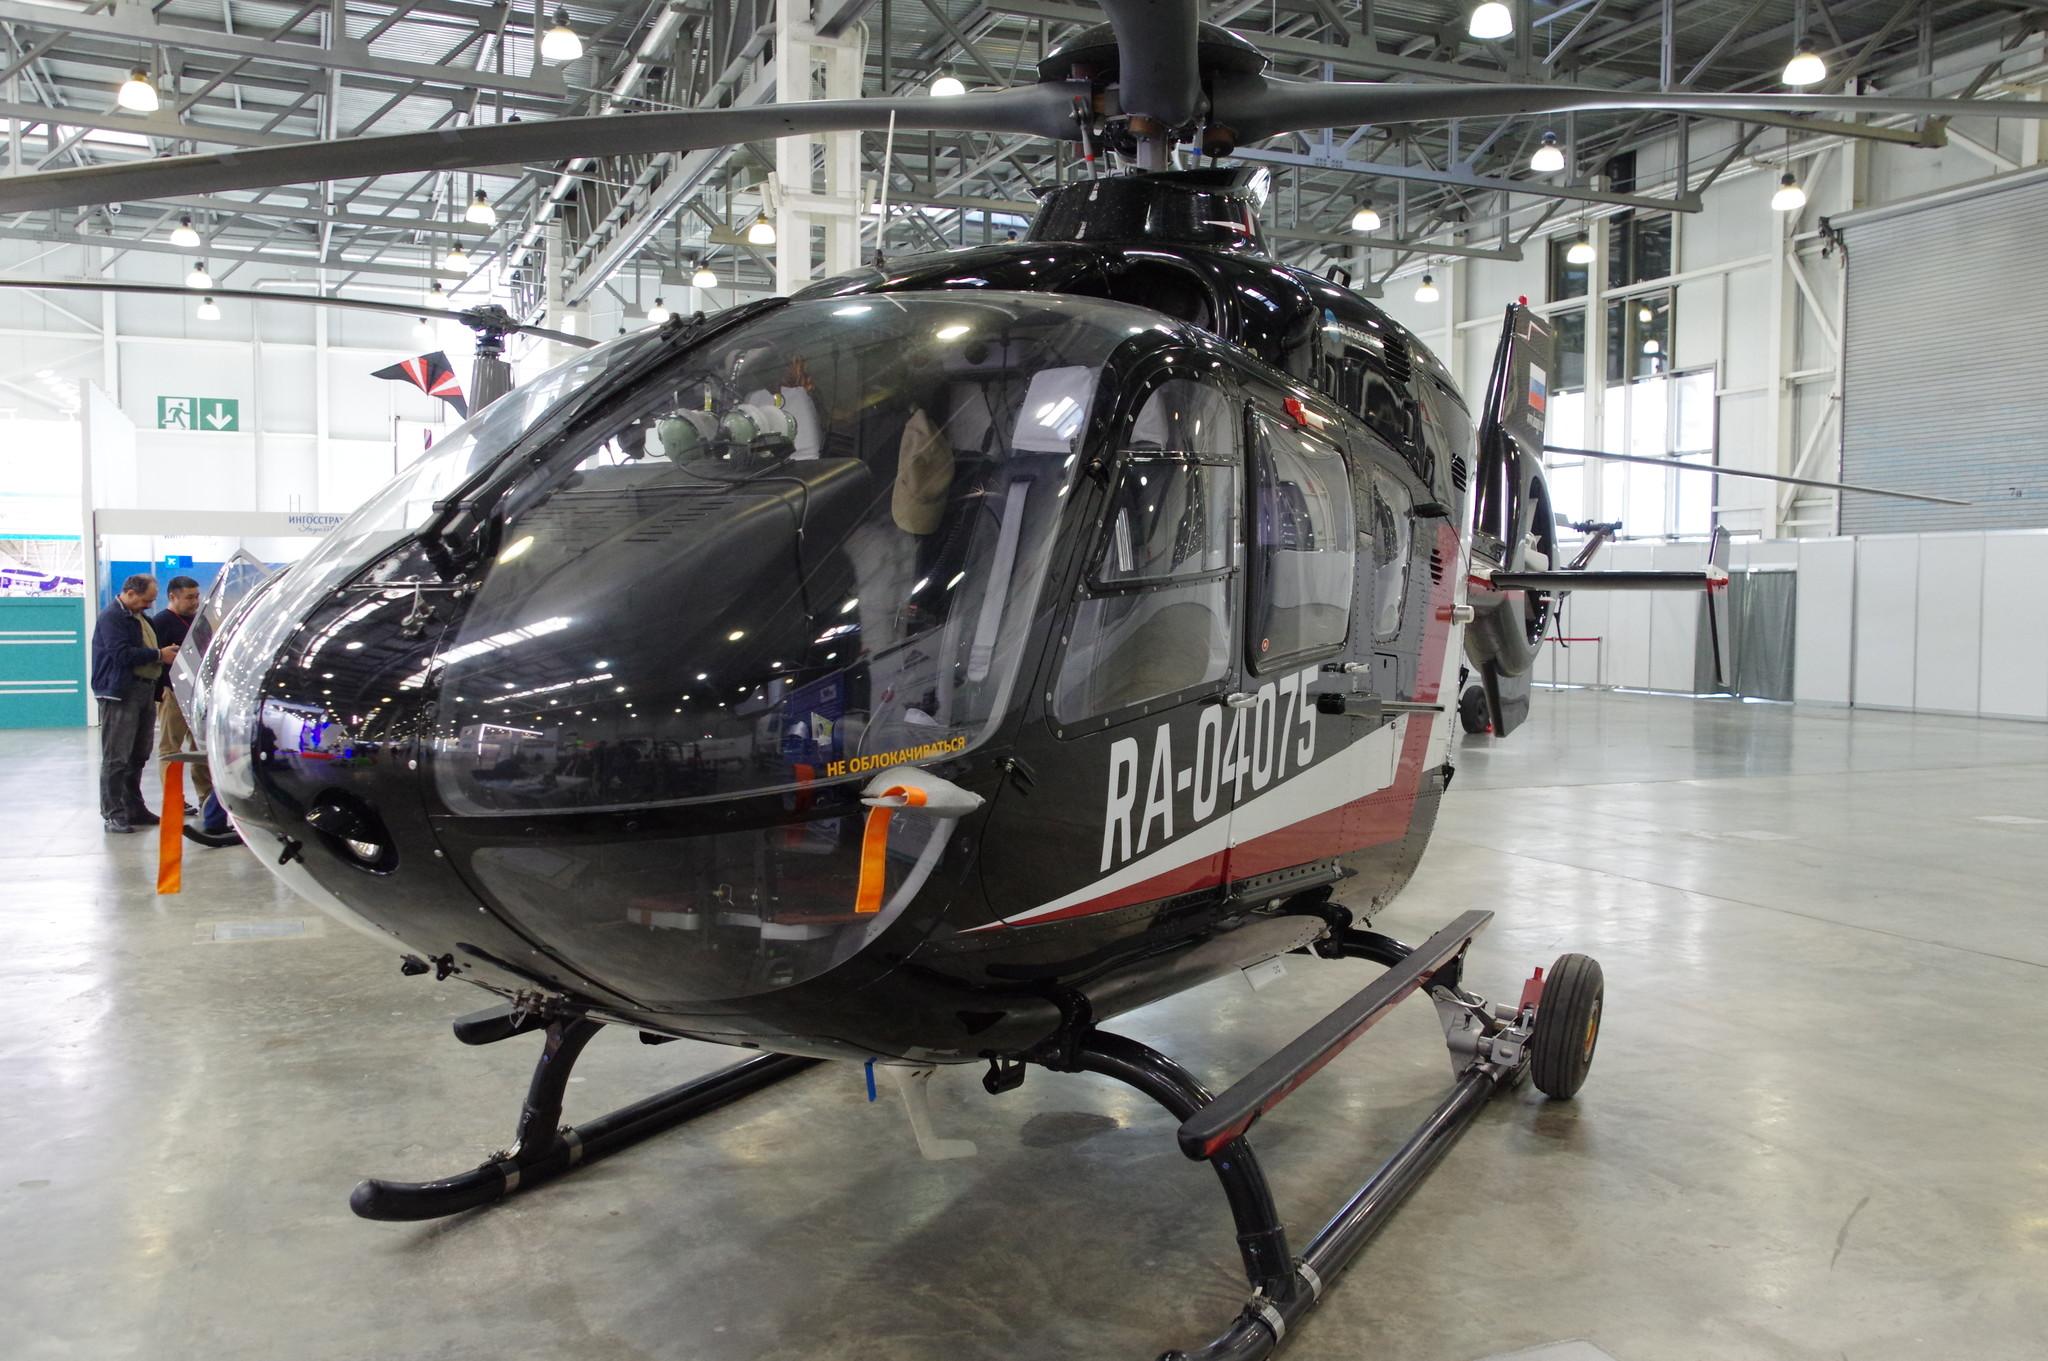 Вертолёт Eurocopter EC135 P2+ (RA-04075)